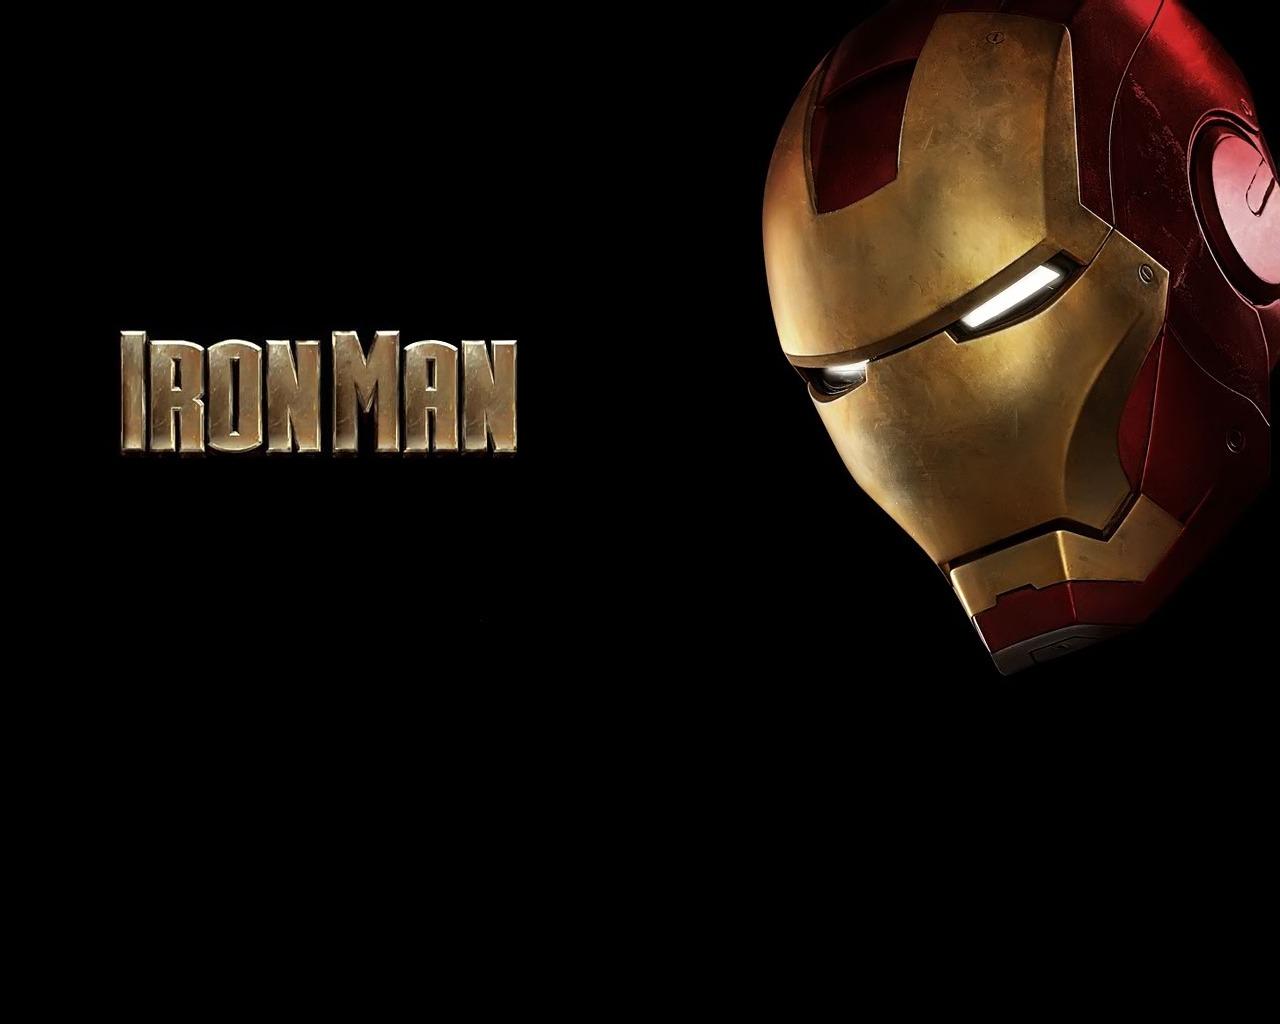 Iron man movie wallpaper iron man movies wallpapers in jpg format iron man movie wallpaper iron man movies wallpapers voltagebd Choice Image